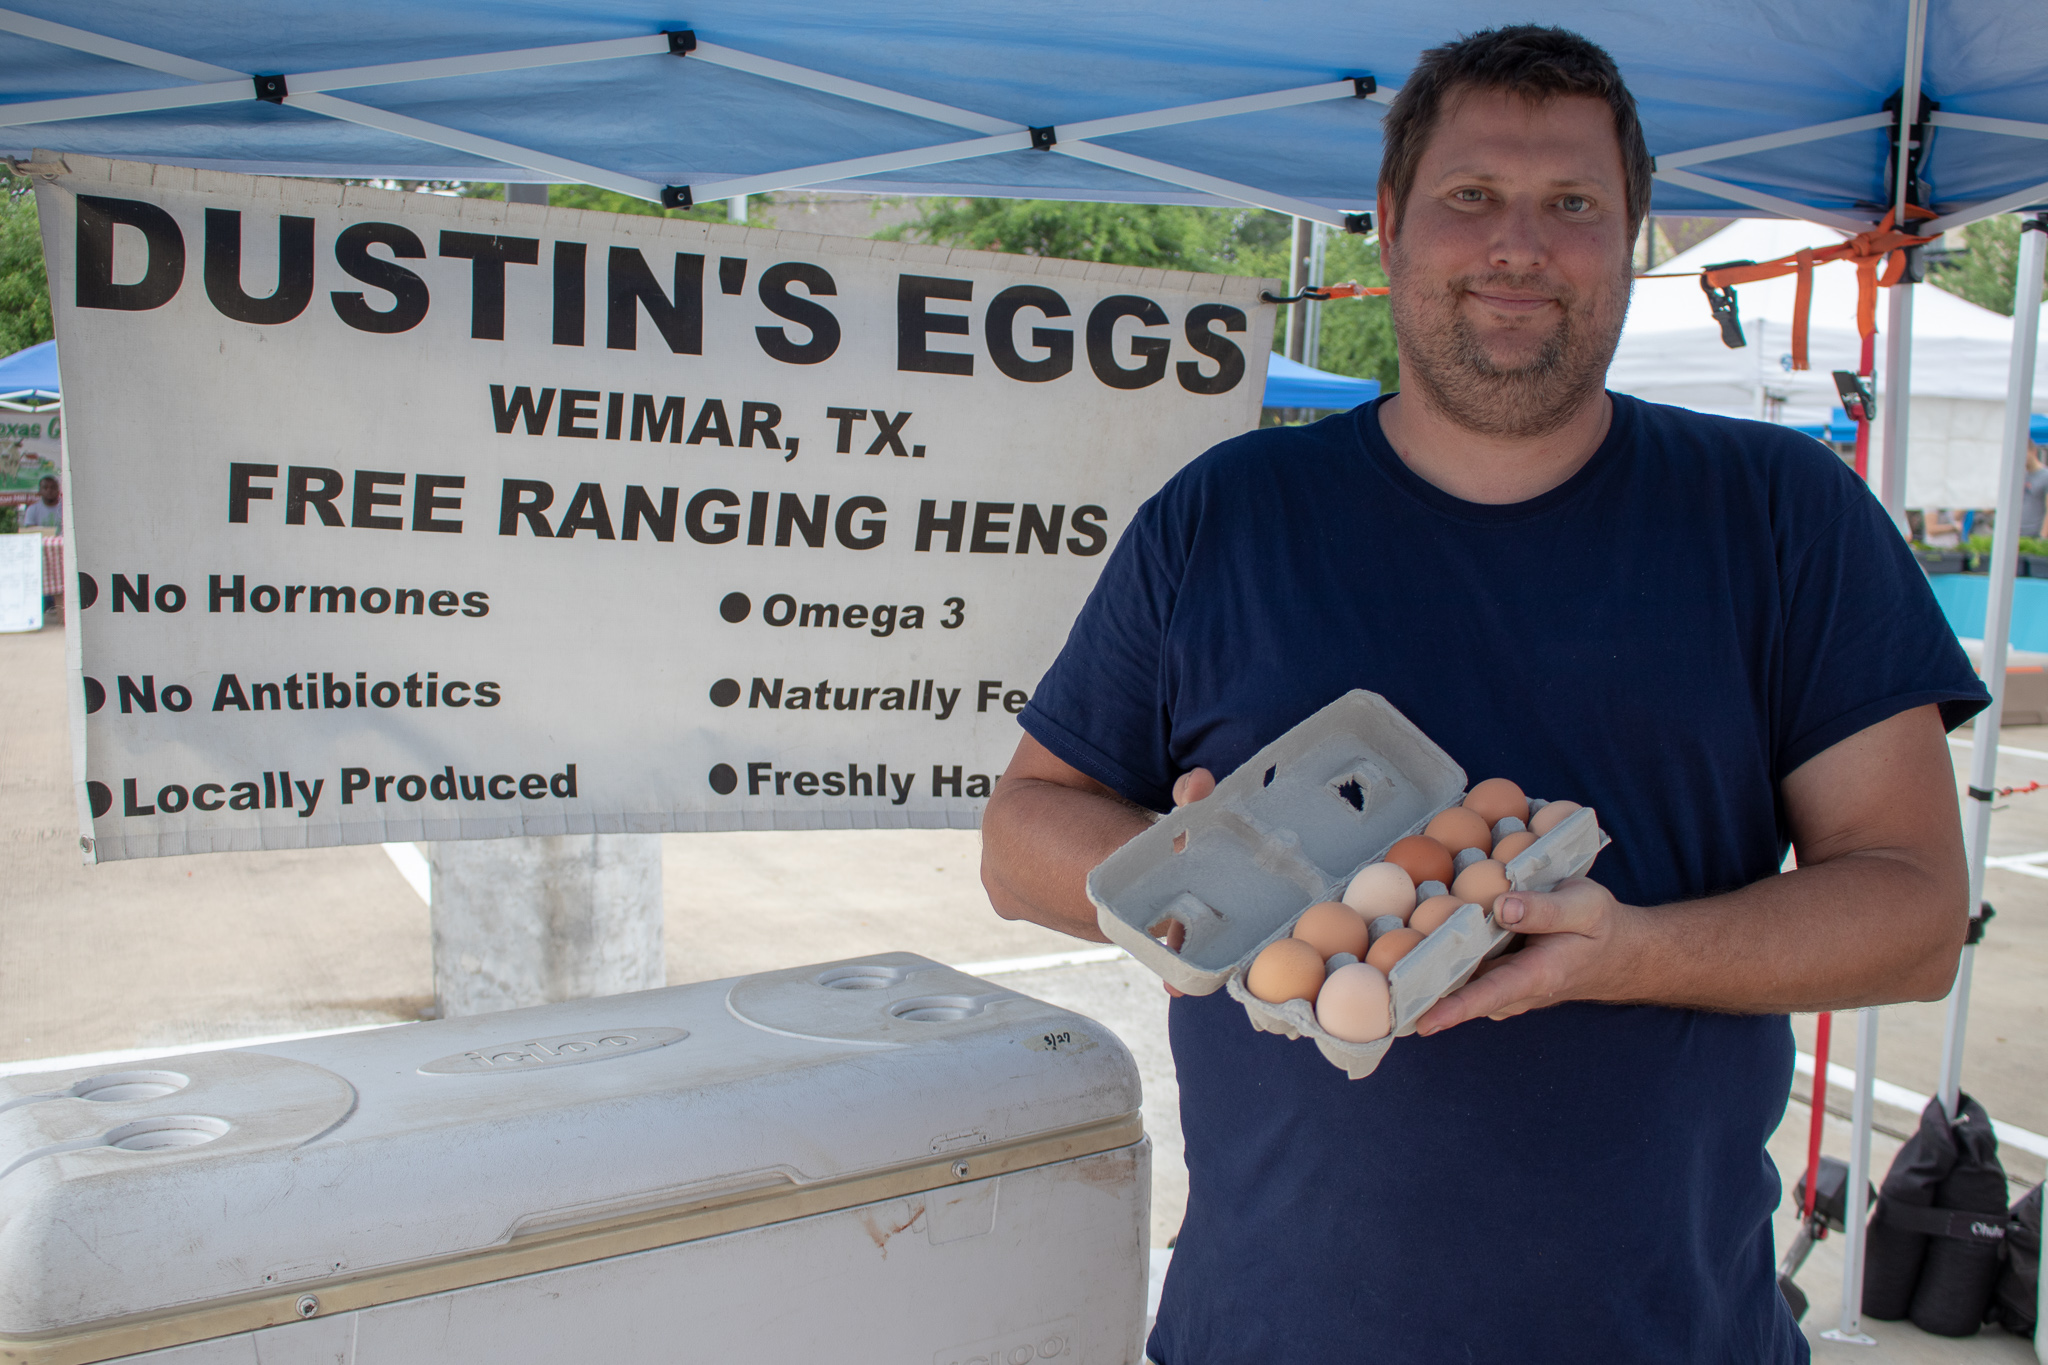 Dustin's Eggs